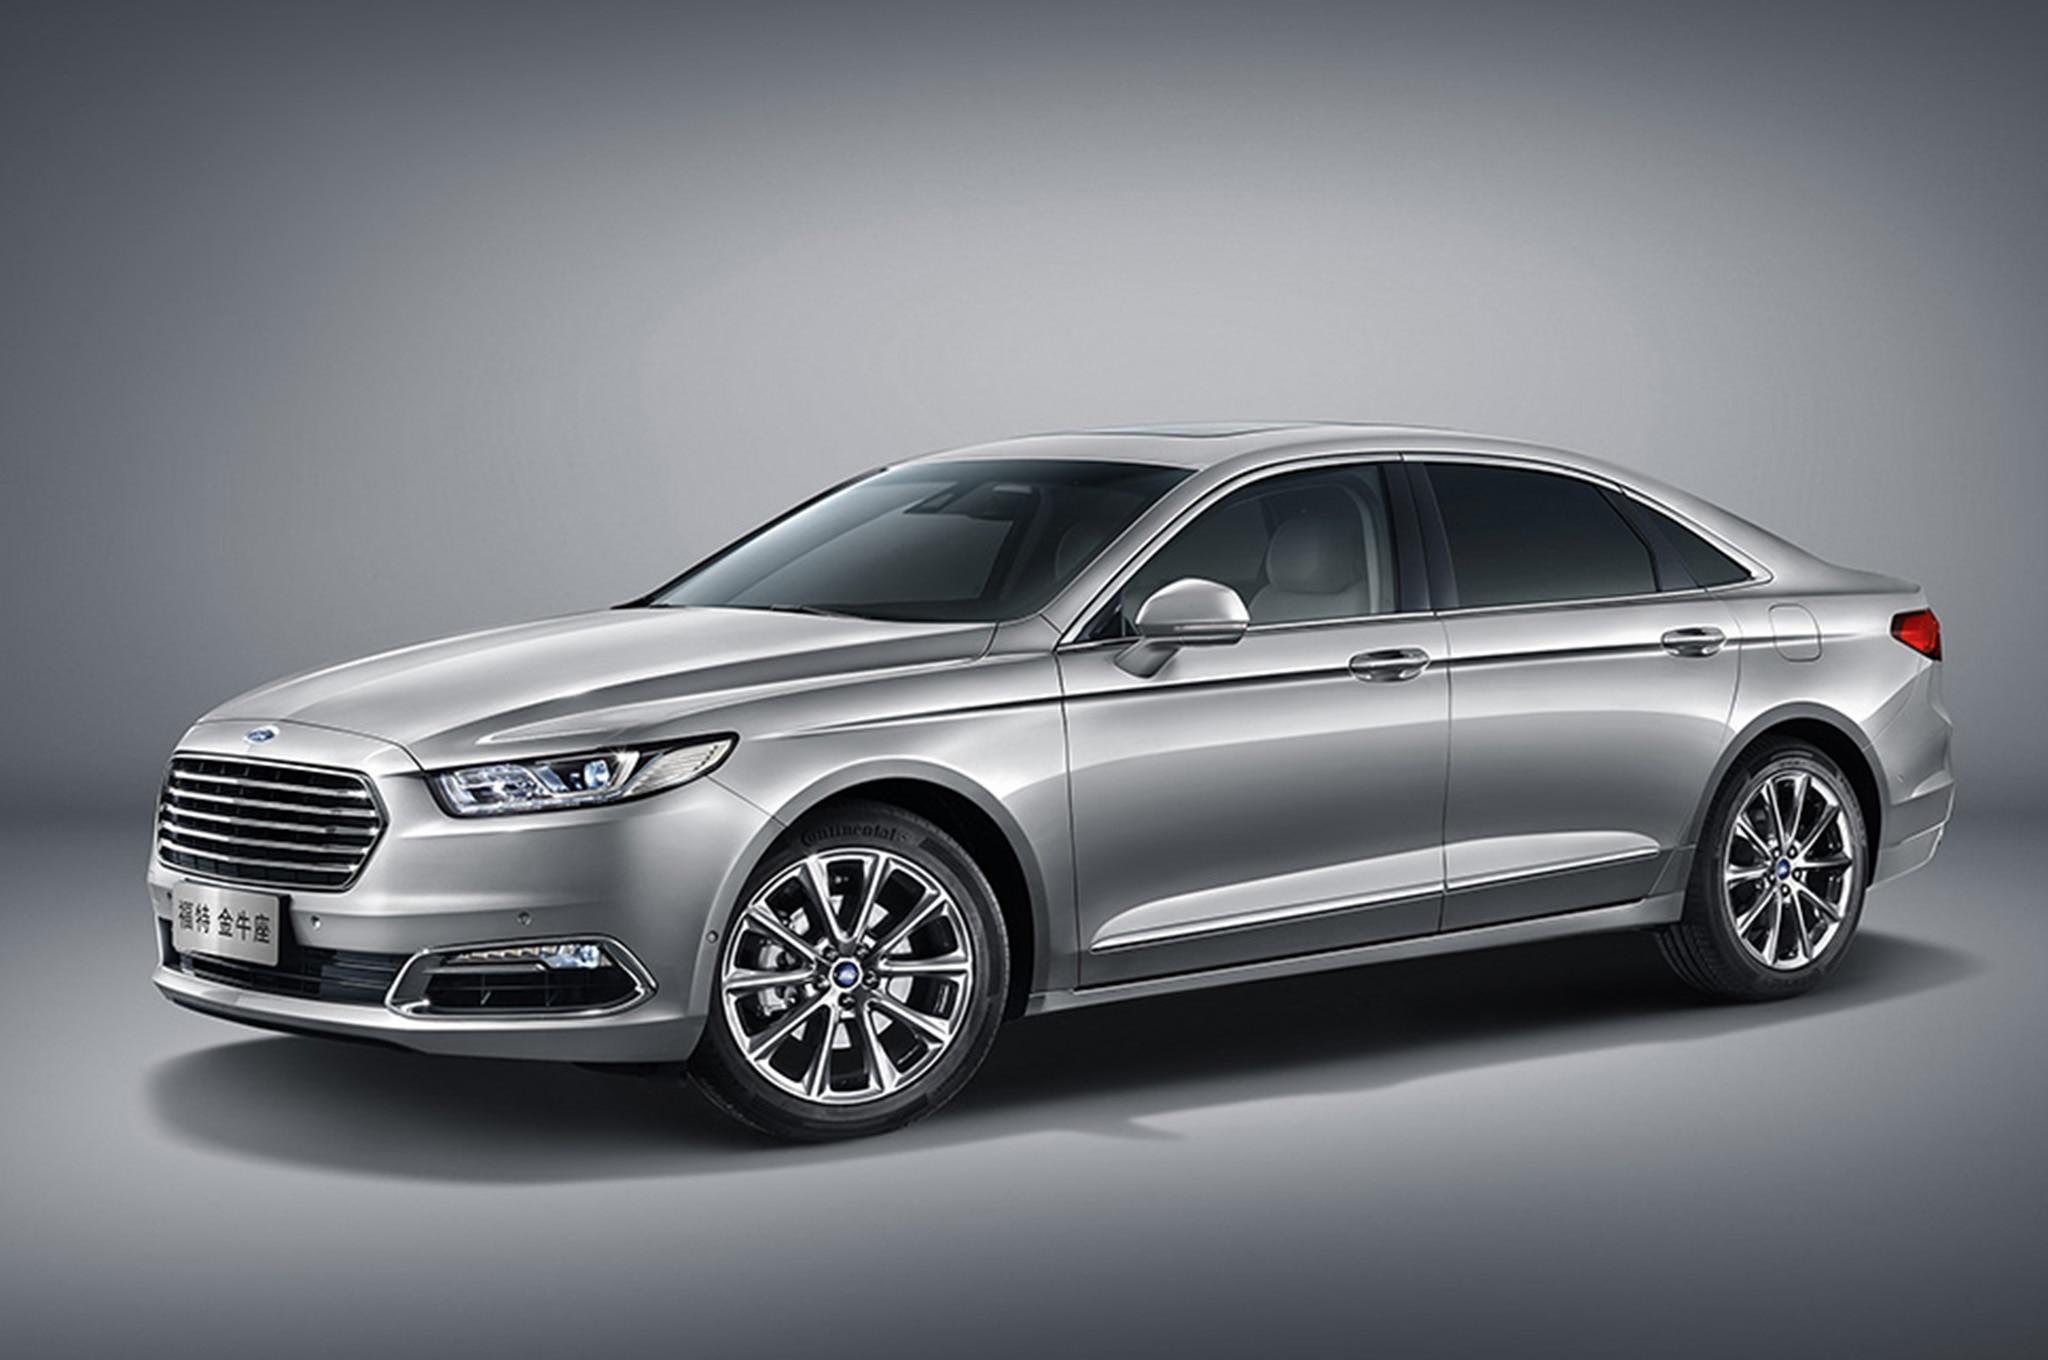 1|8 & 2016 Ford Taurus Revealed for China markmcfarlin.com